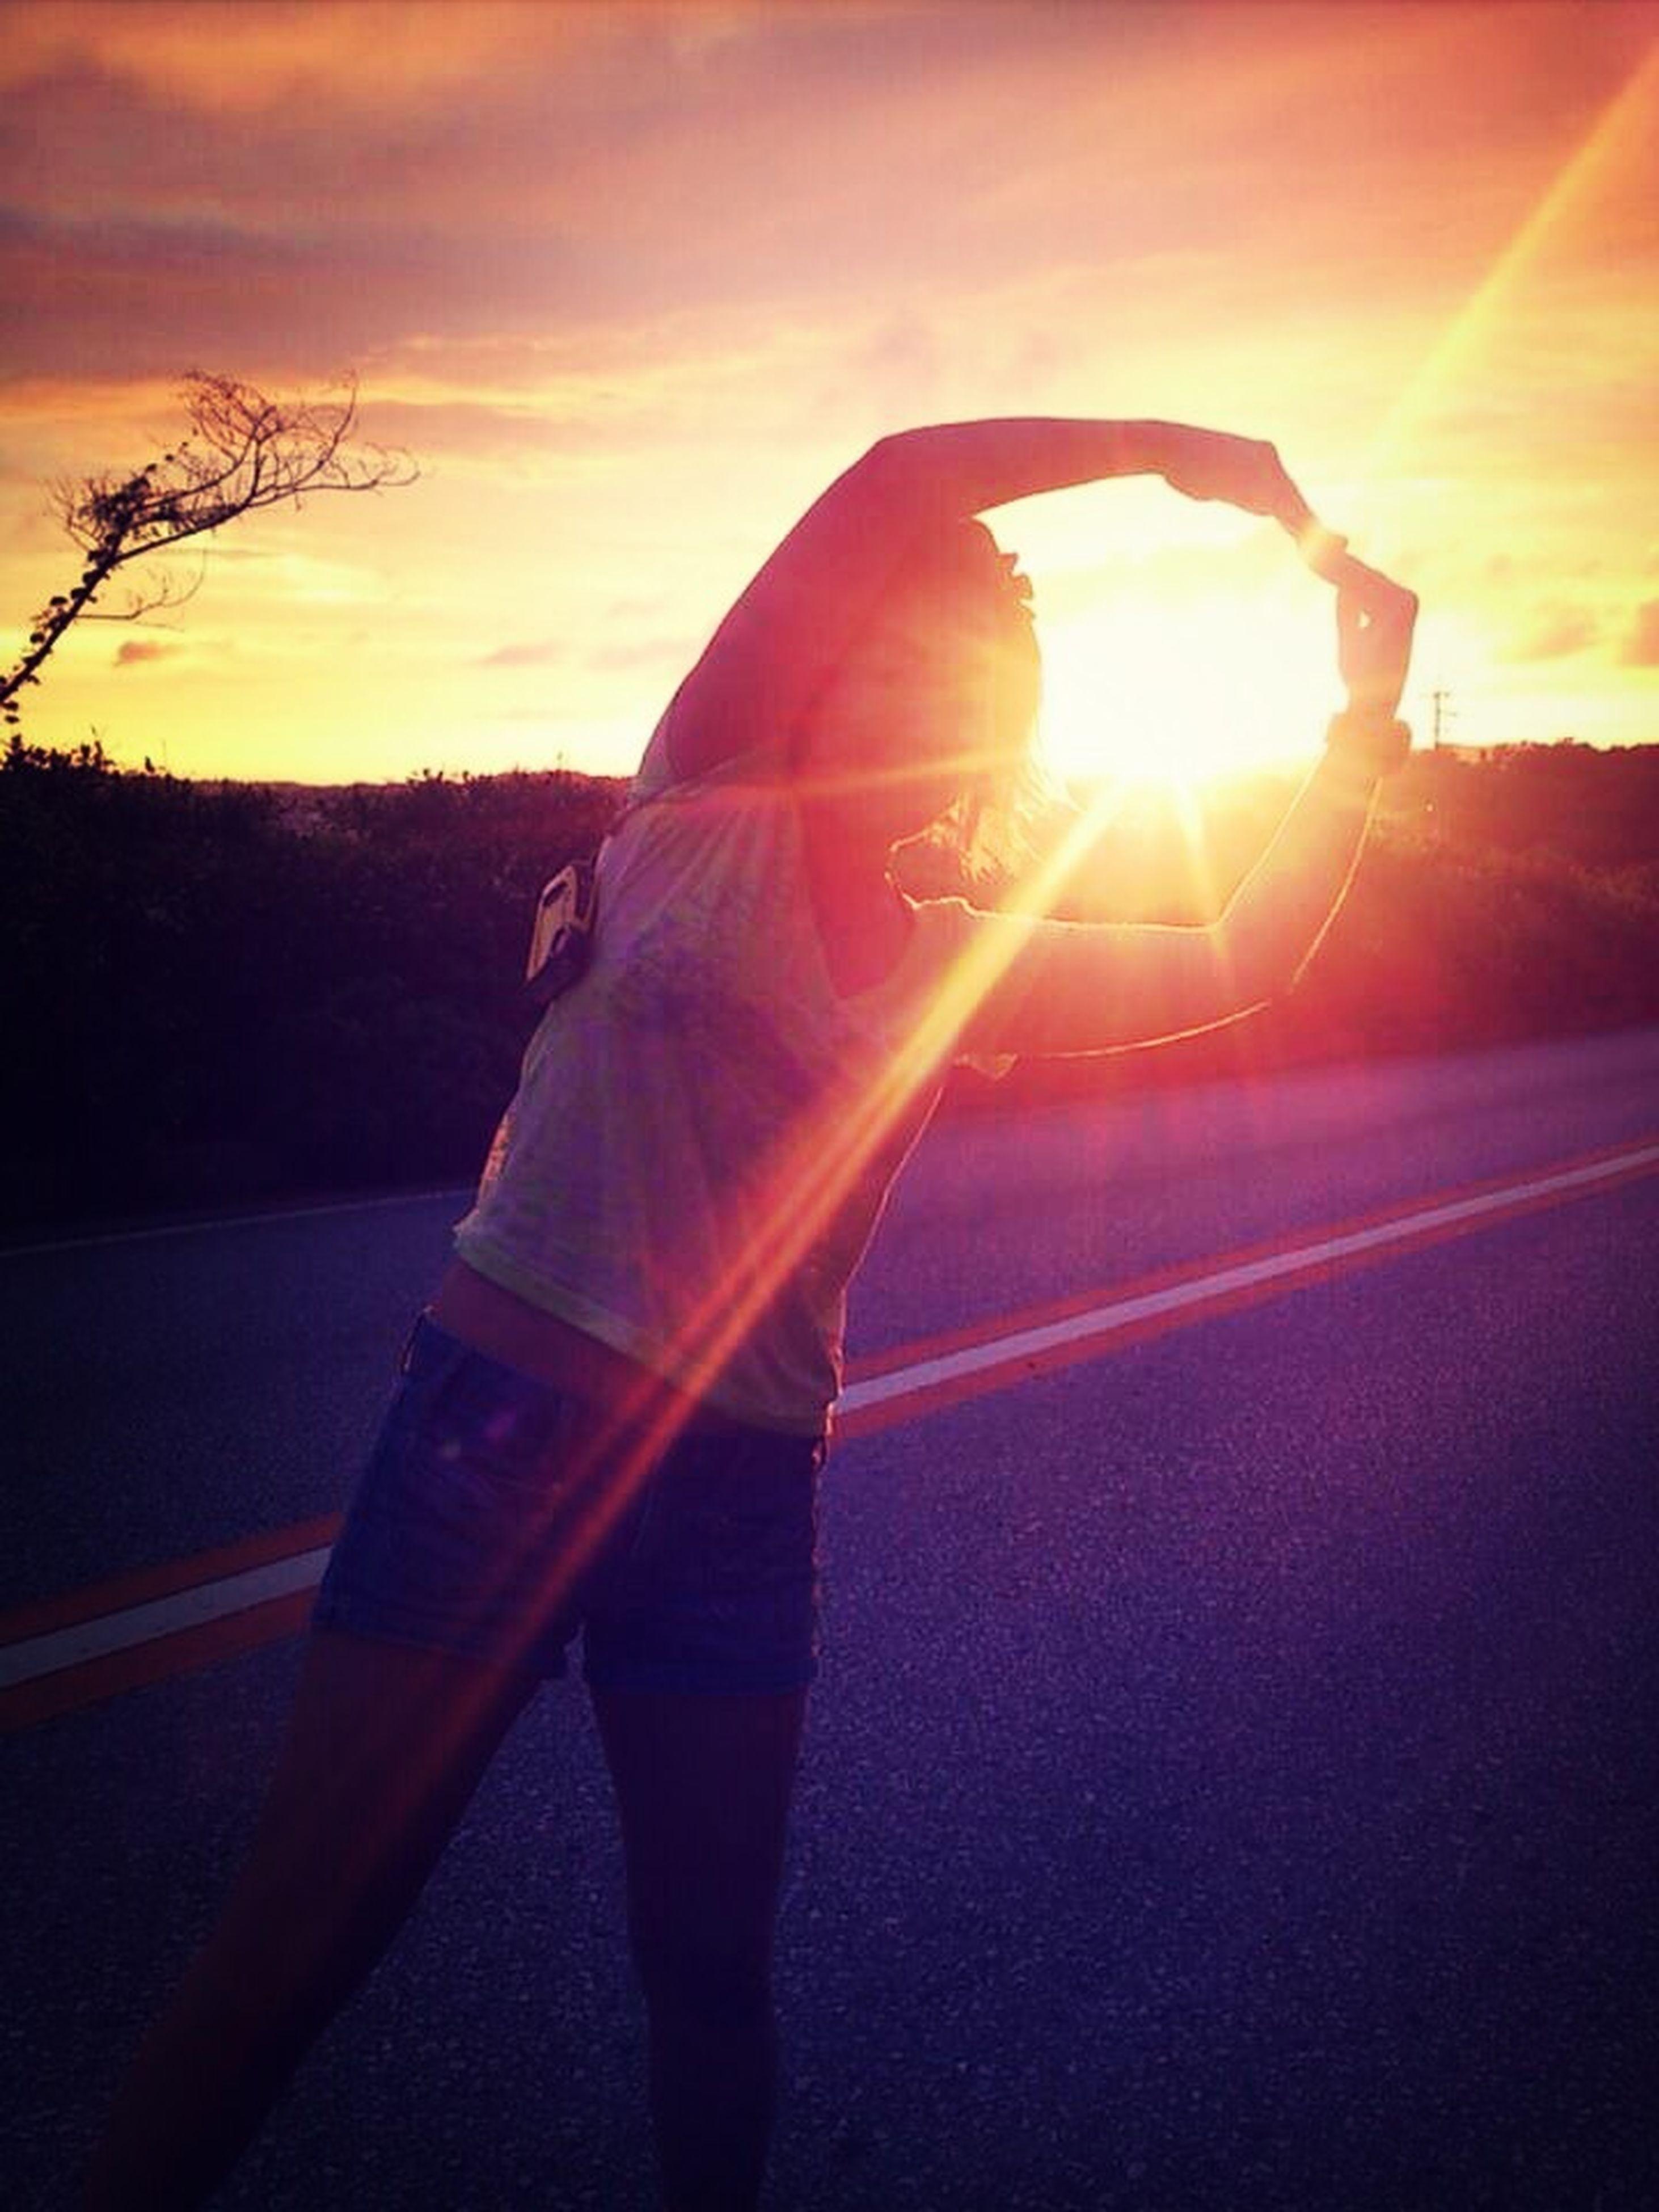 sunset, sun, sunbeam, lens flare, orange color, transportation, sunlight, sky, lifestyles, leisure activity, men, road, silhouette, car, rear view, tree, street, unrecognizable person